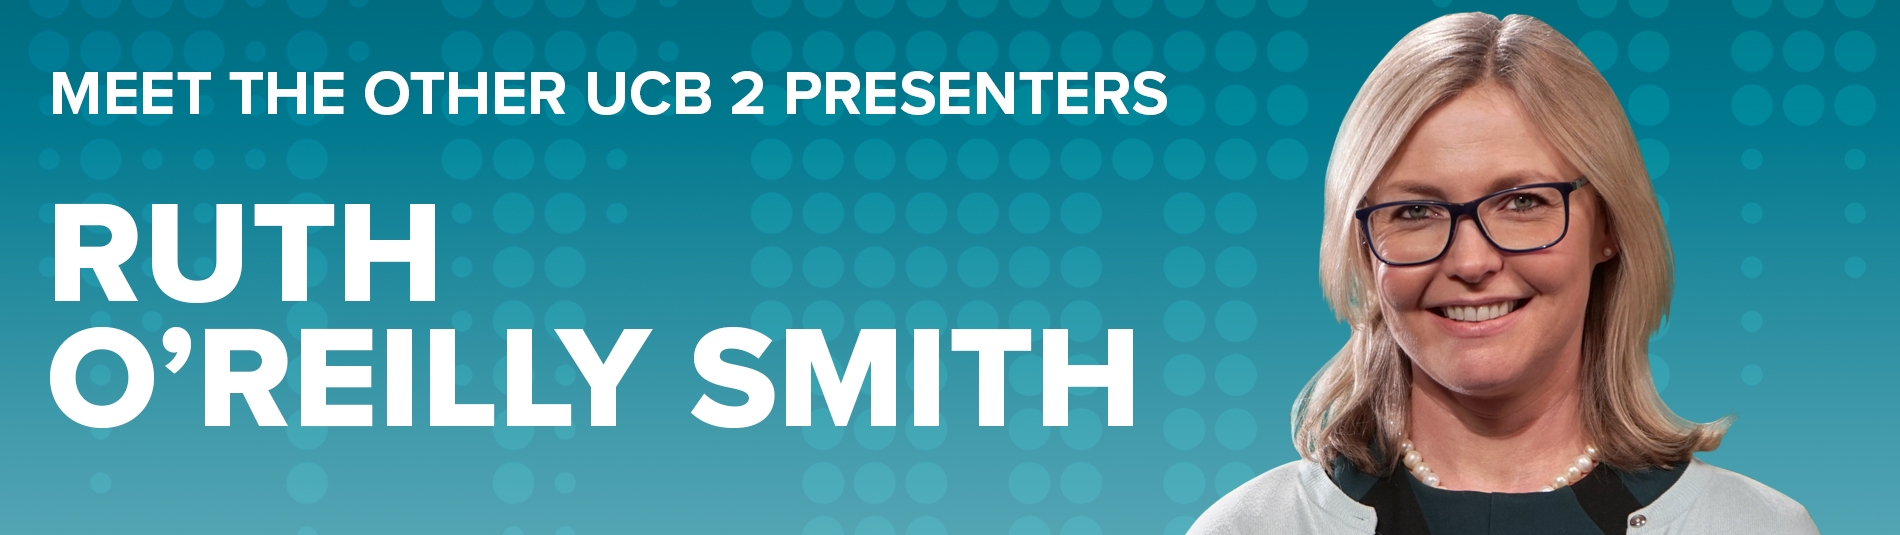 Ruth O'Reilly Smith